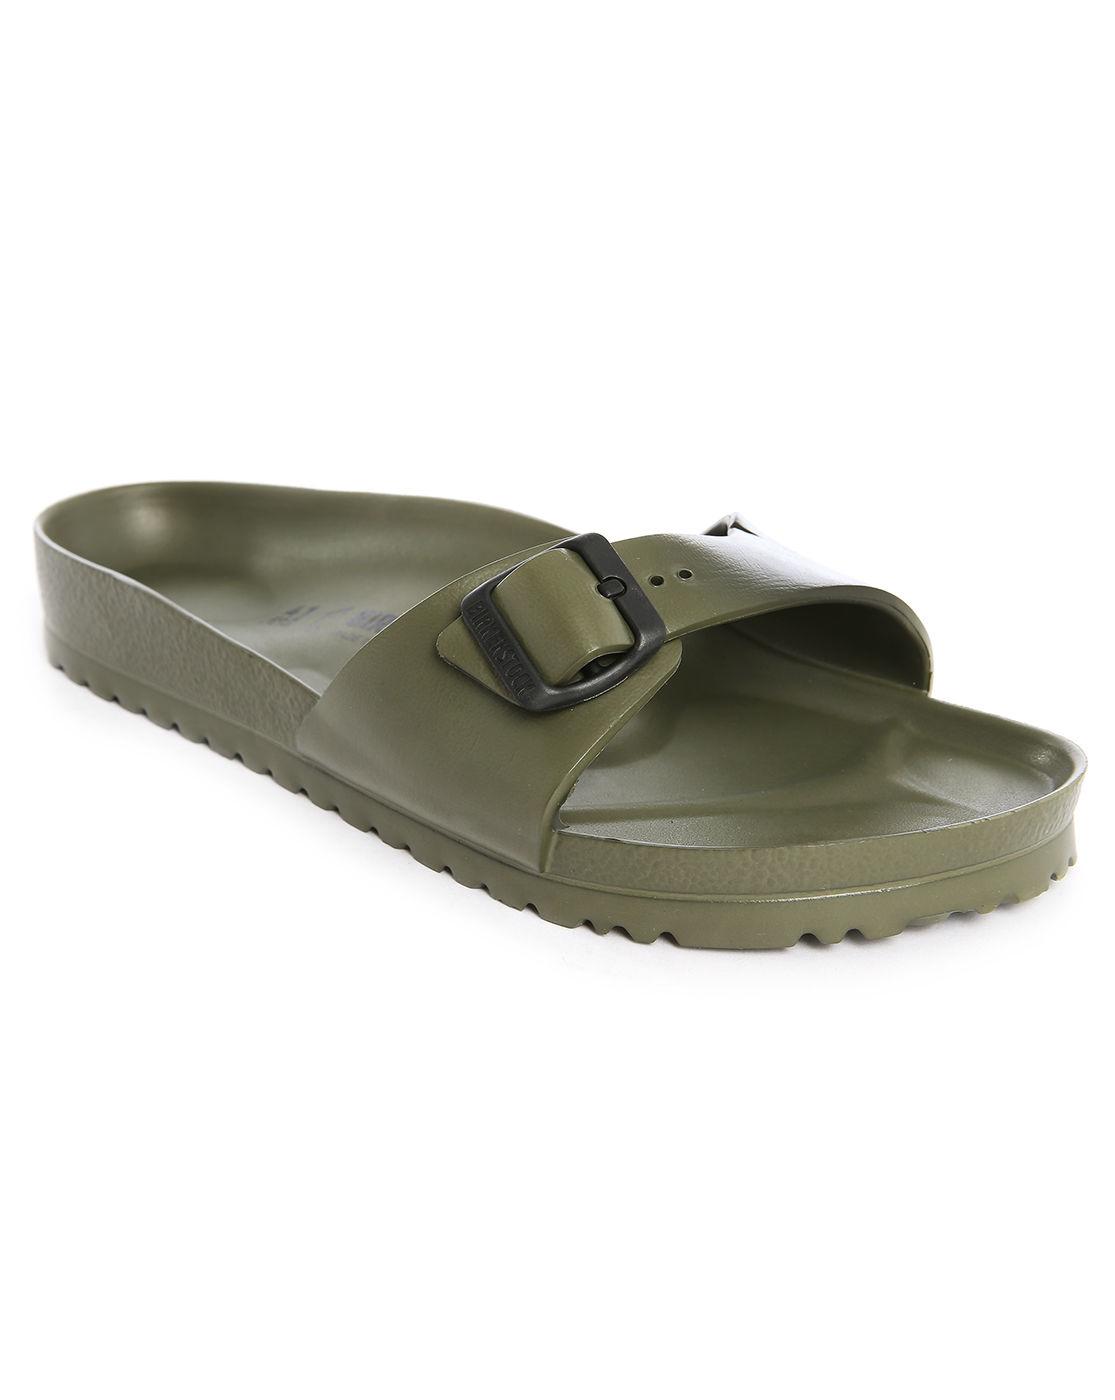 birkenstock eva madrid khaki sandals in khaki for men lyst. Black Bedroom Furniture Sets. Home Design Ideas